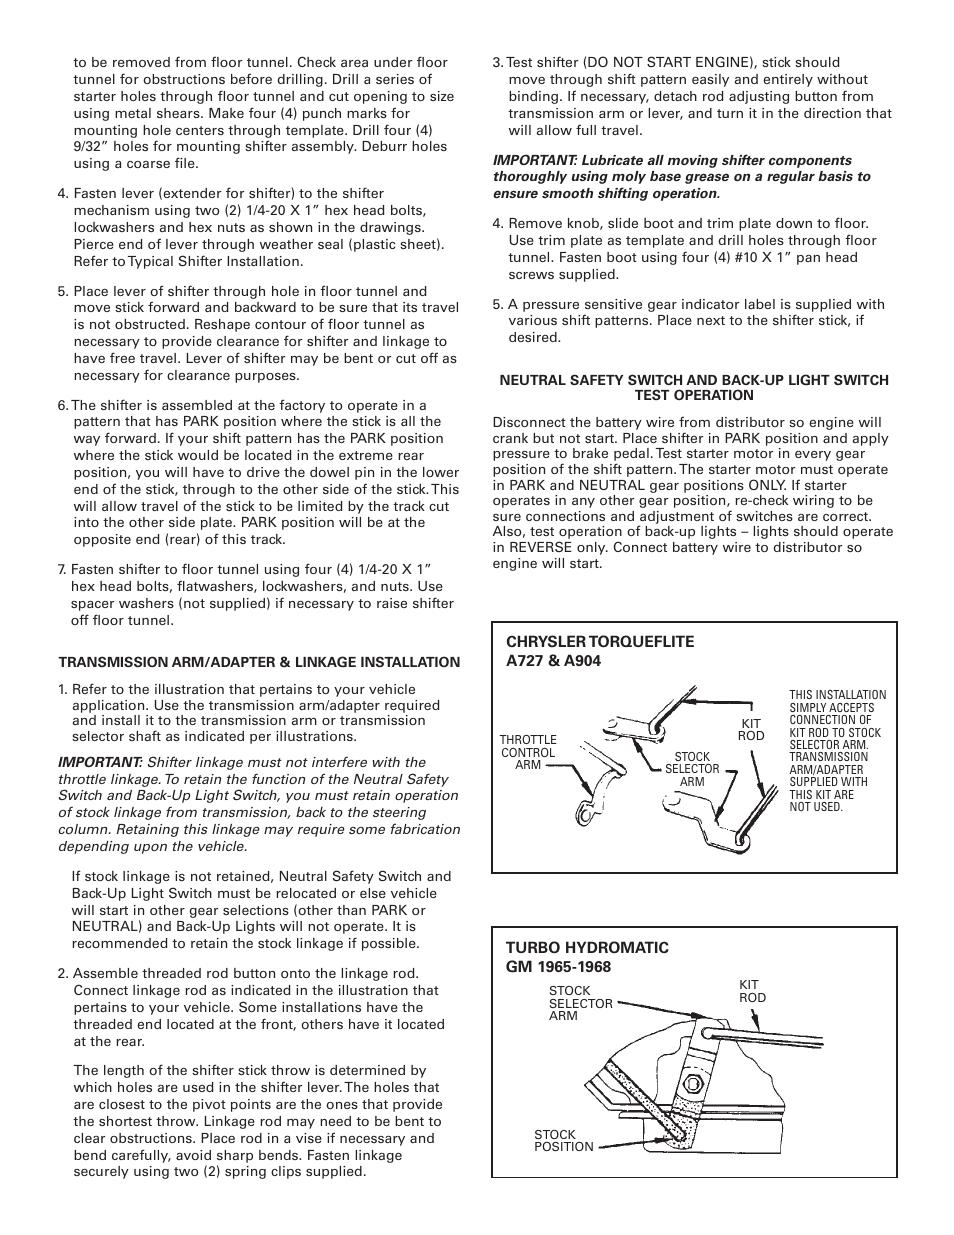 Mr Gasket 7668 Floor Shifter Conversion 3 4 Speed Auto User Manual Chrysler Engine Diagram